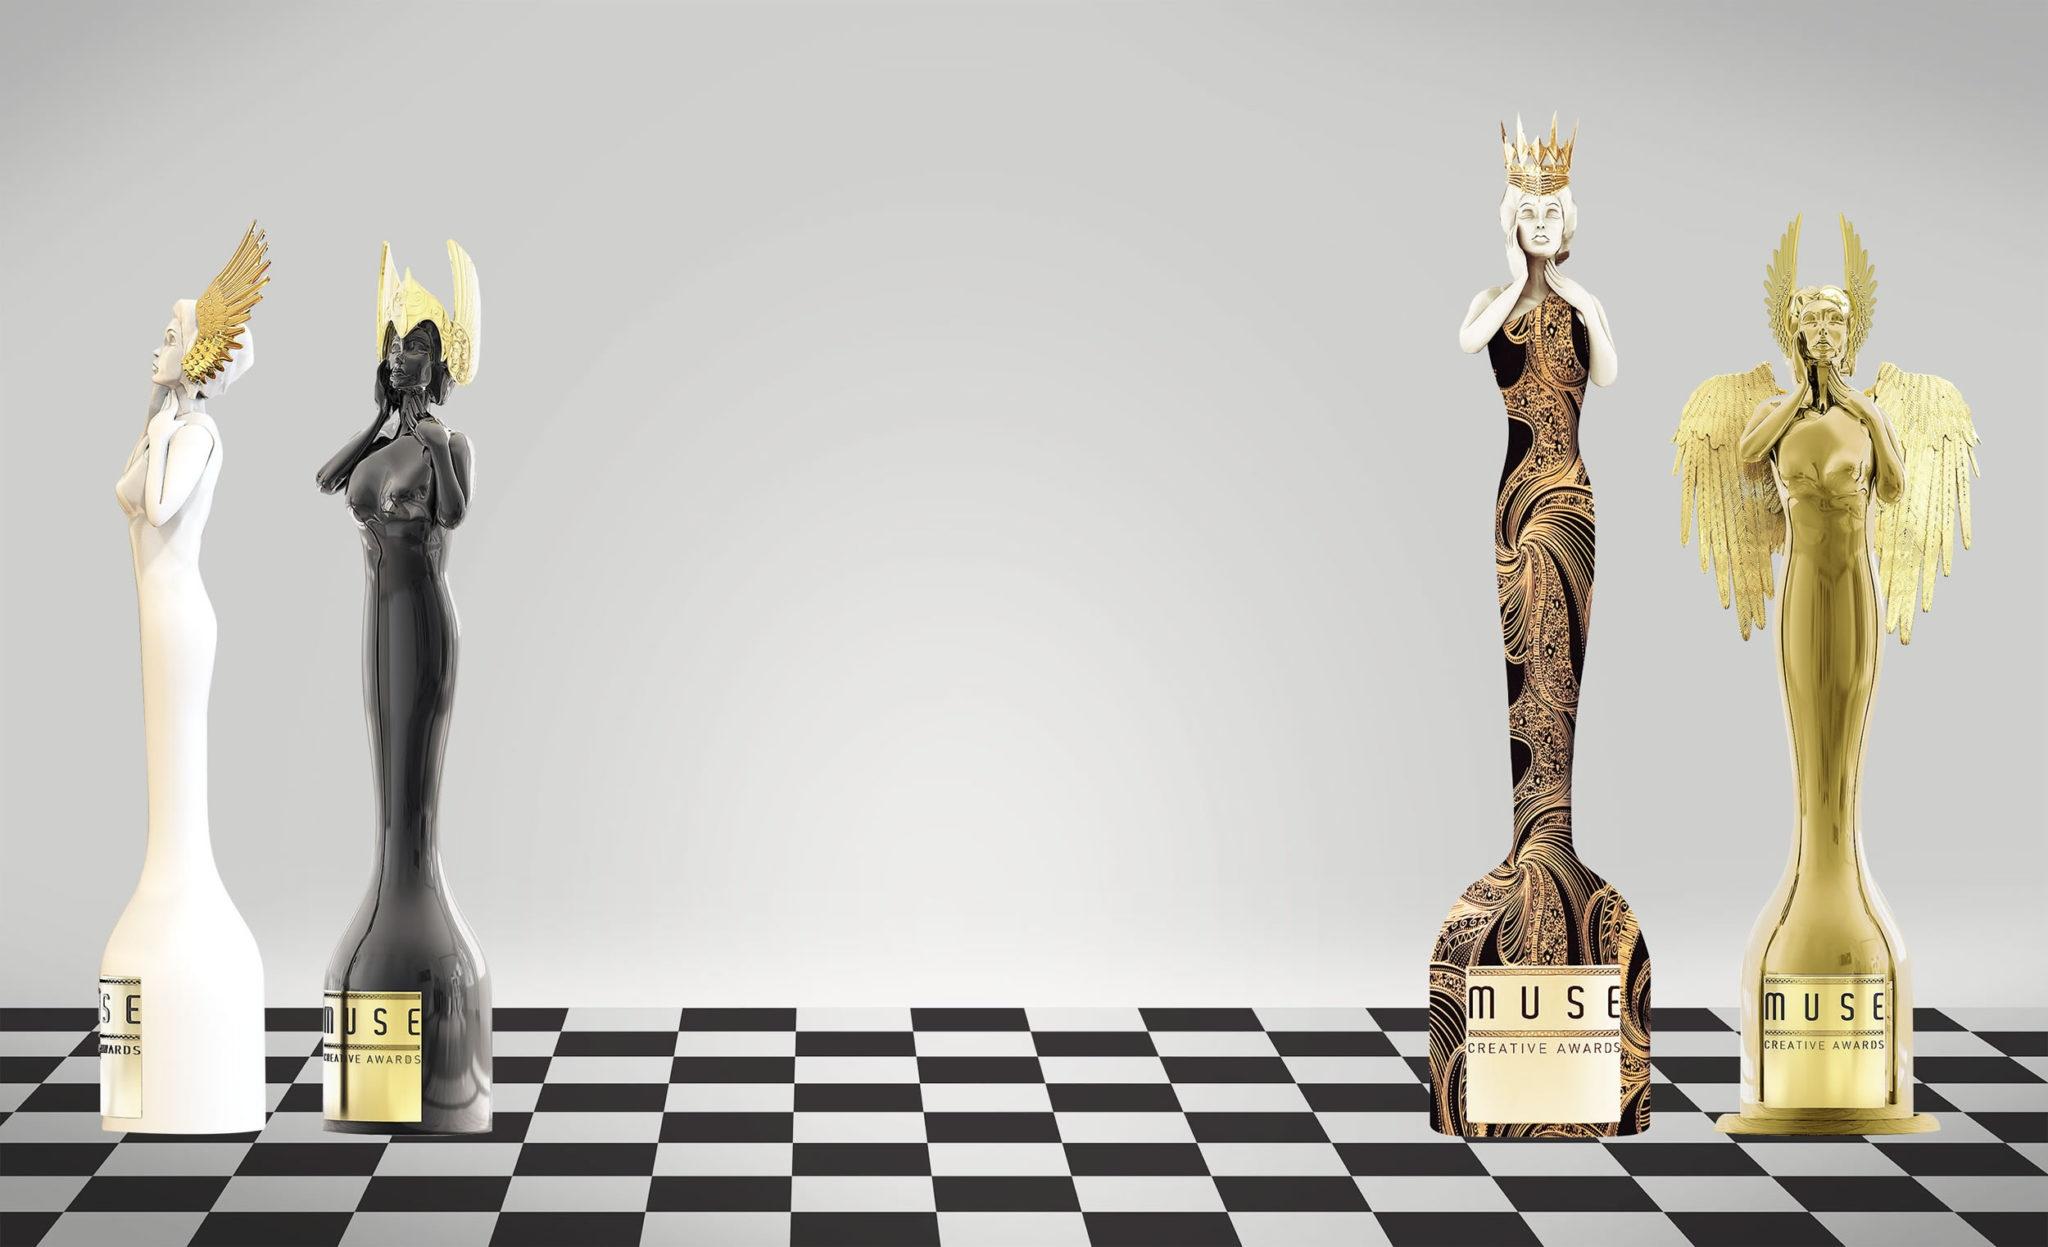 Muse Awards